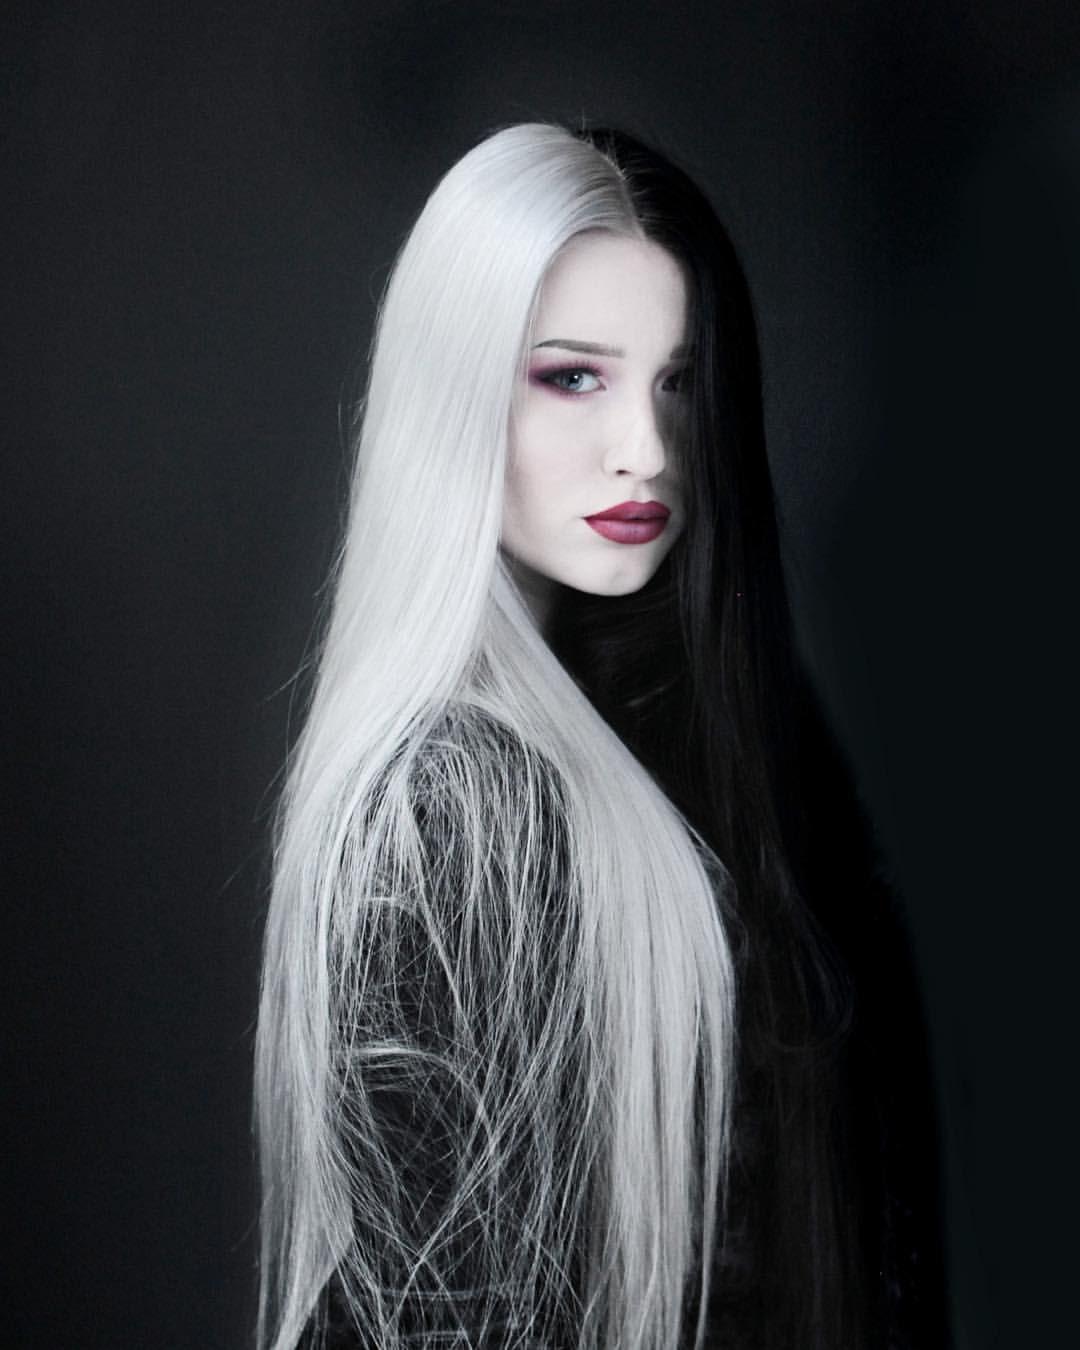 White girls with long black hair — 1